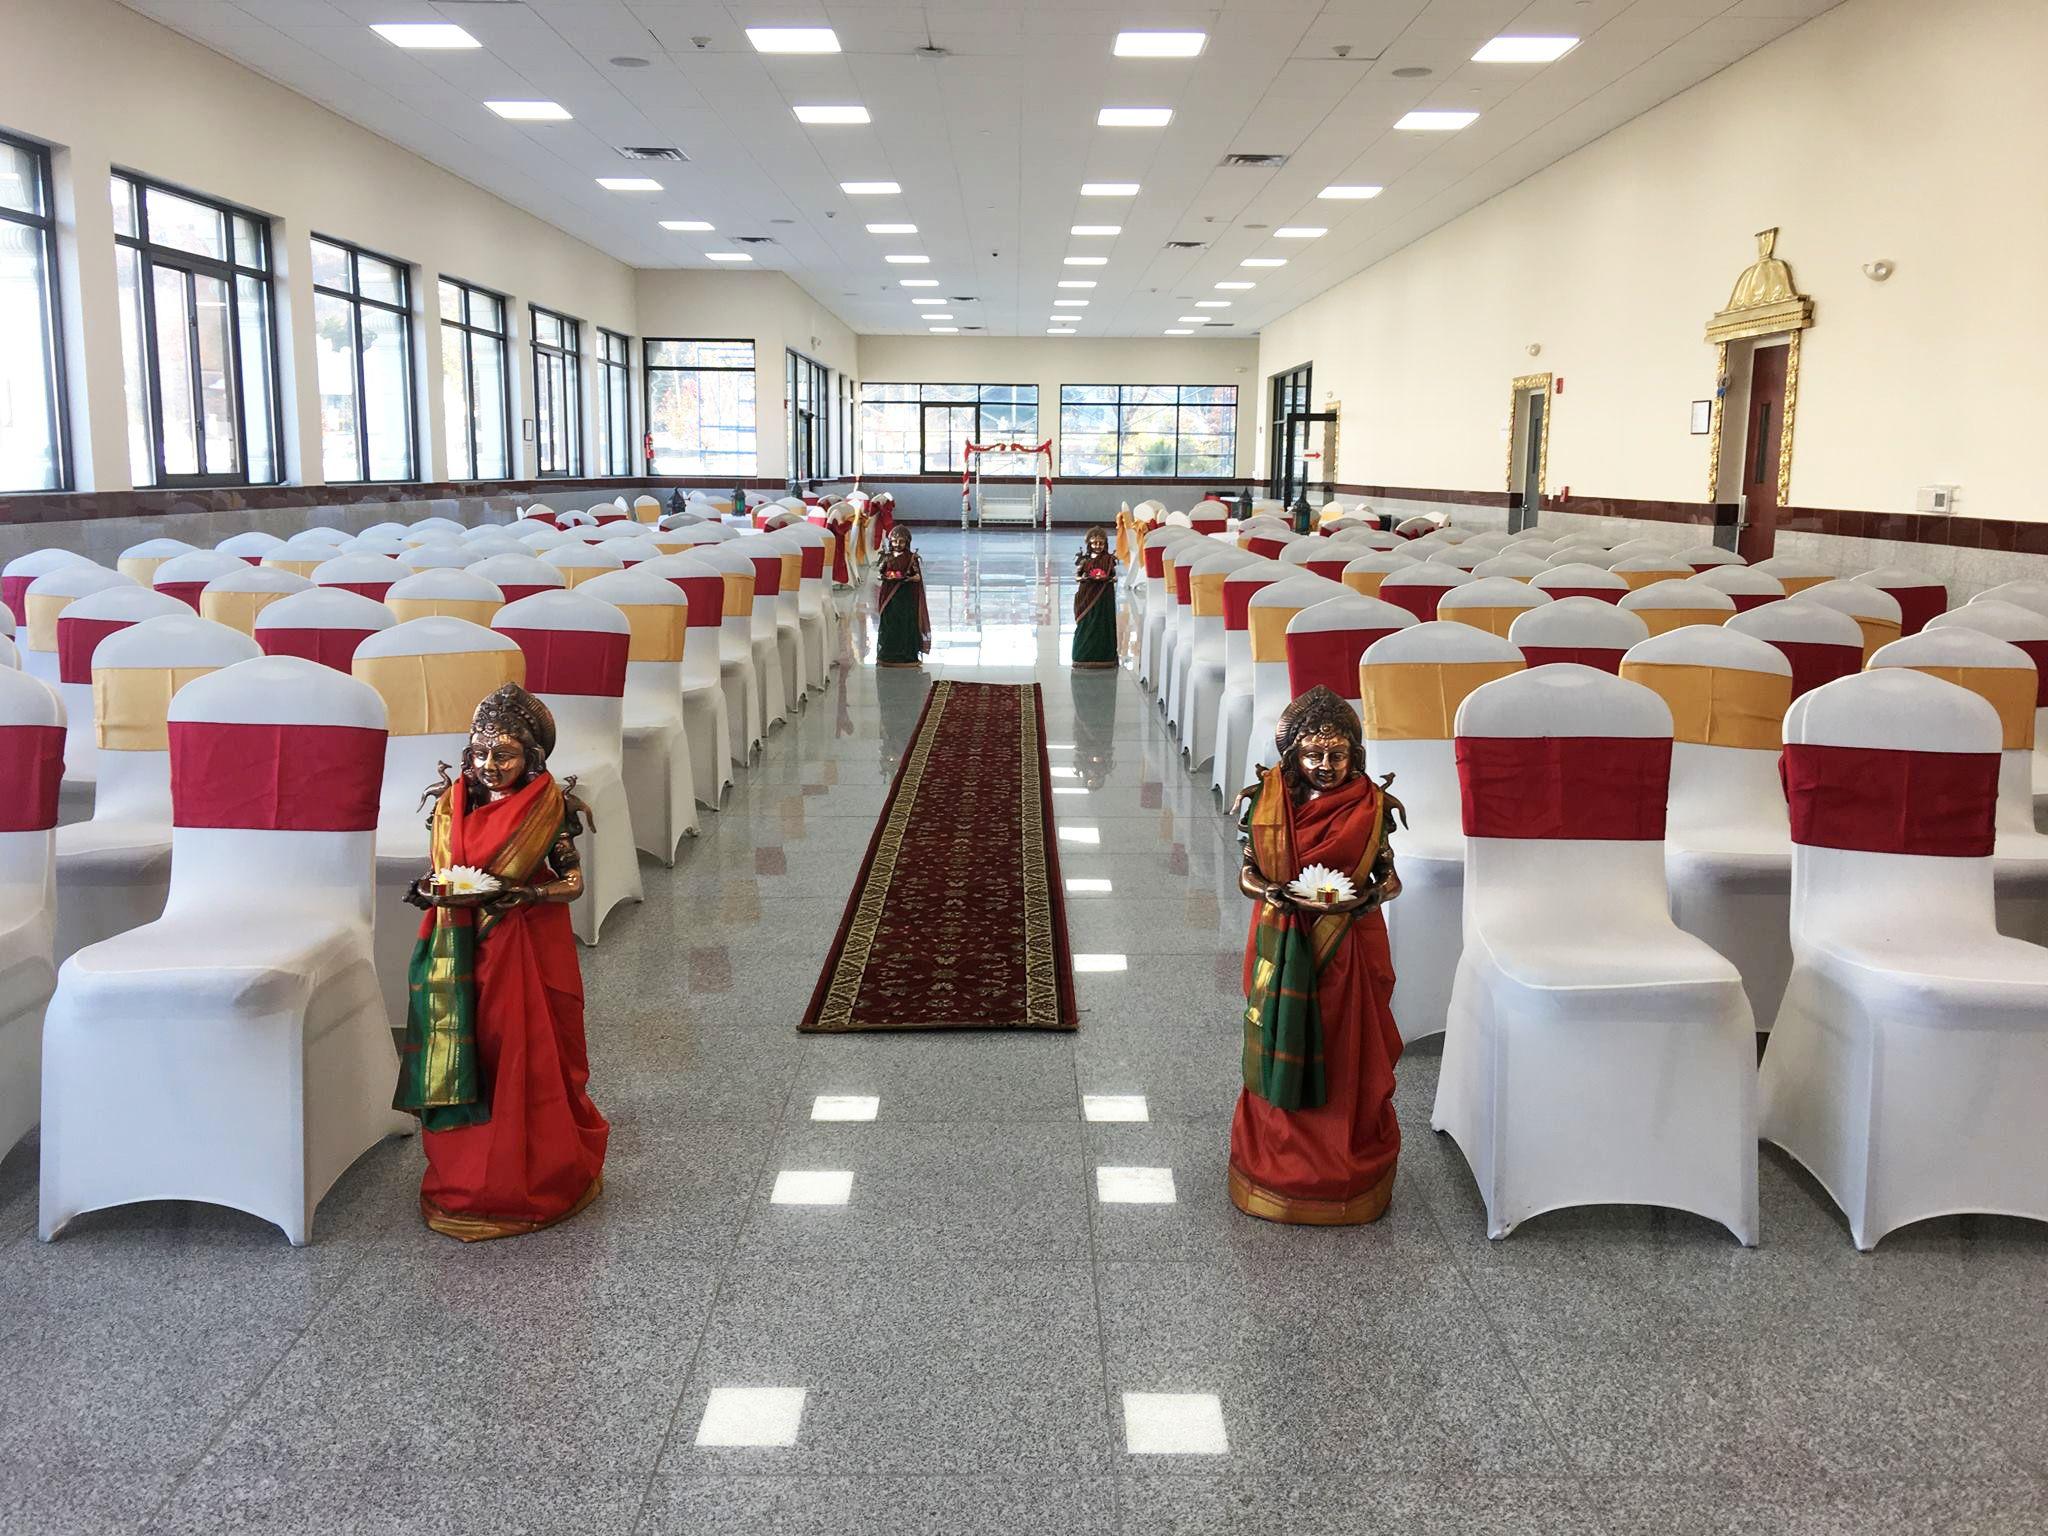 Bridgewater Temple Wedding Aisle, Chairs Decor | Wedding Decor in